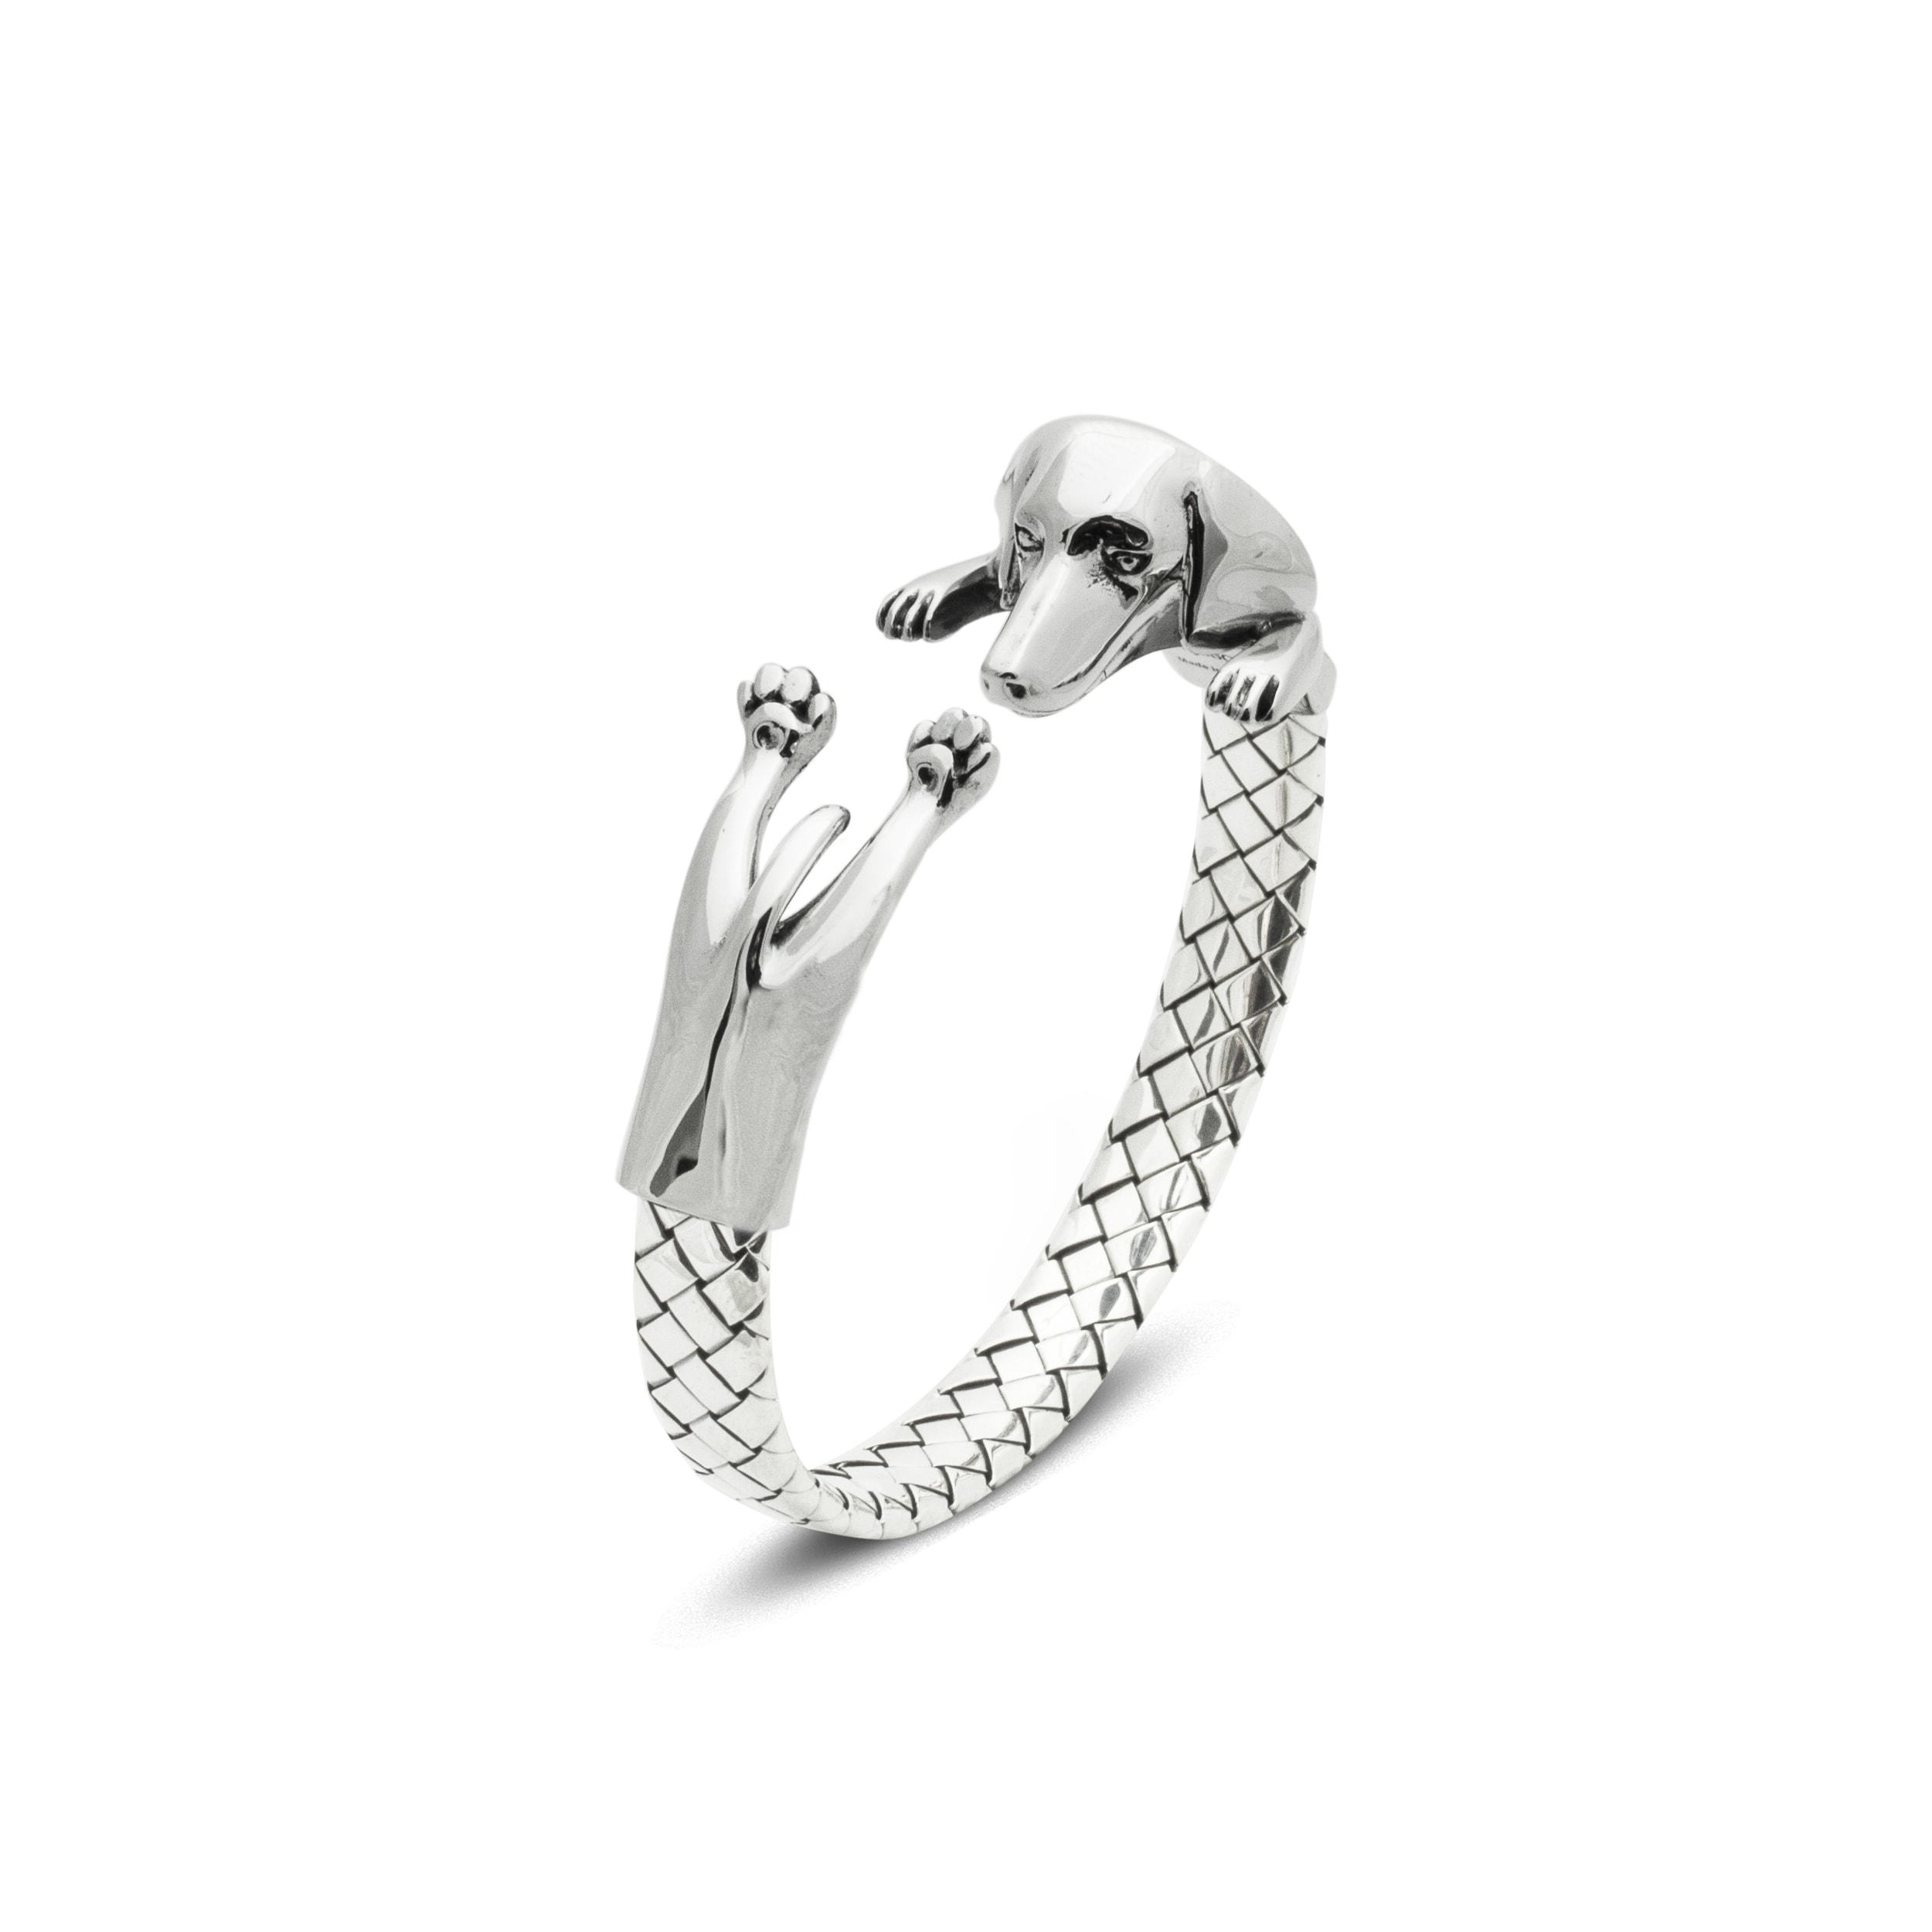 DOG-FEVER-HUG-BRACELETS-dachshund-silver-hug-bracelet